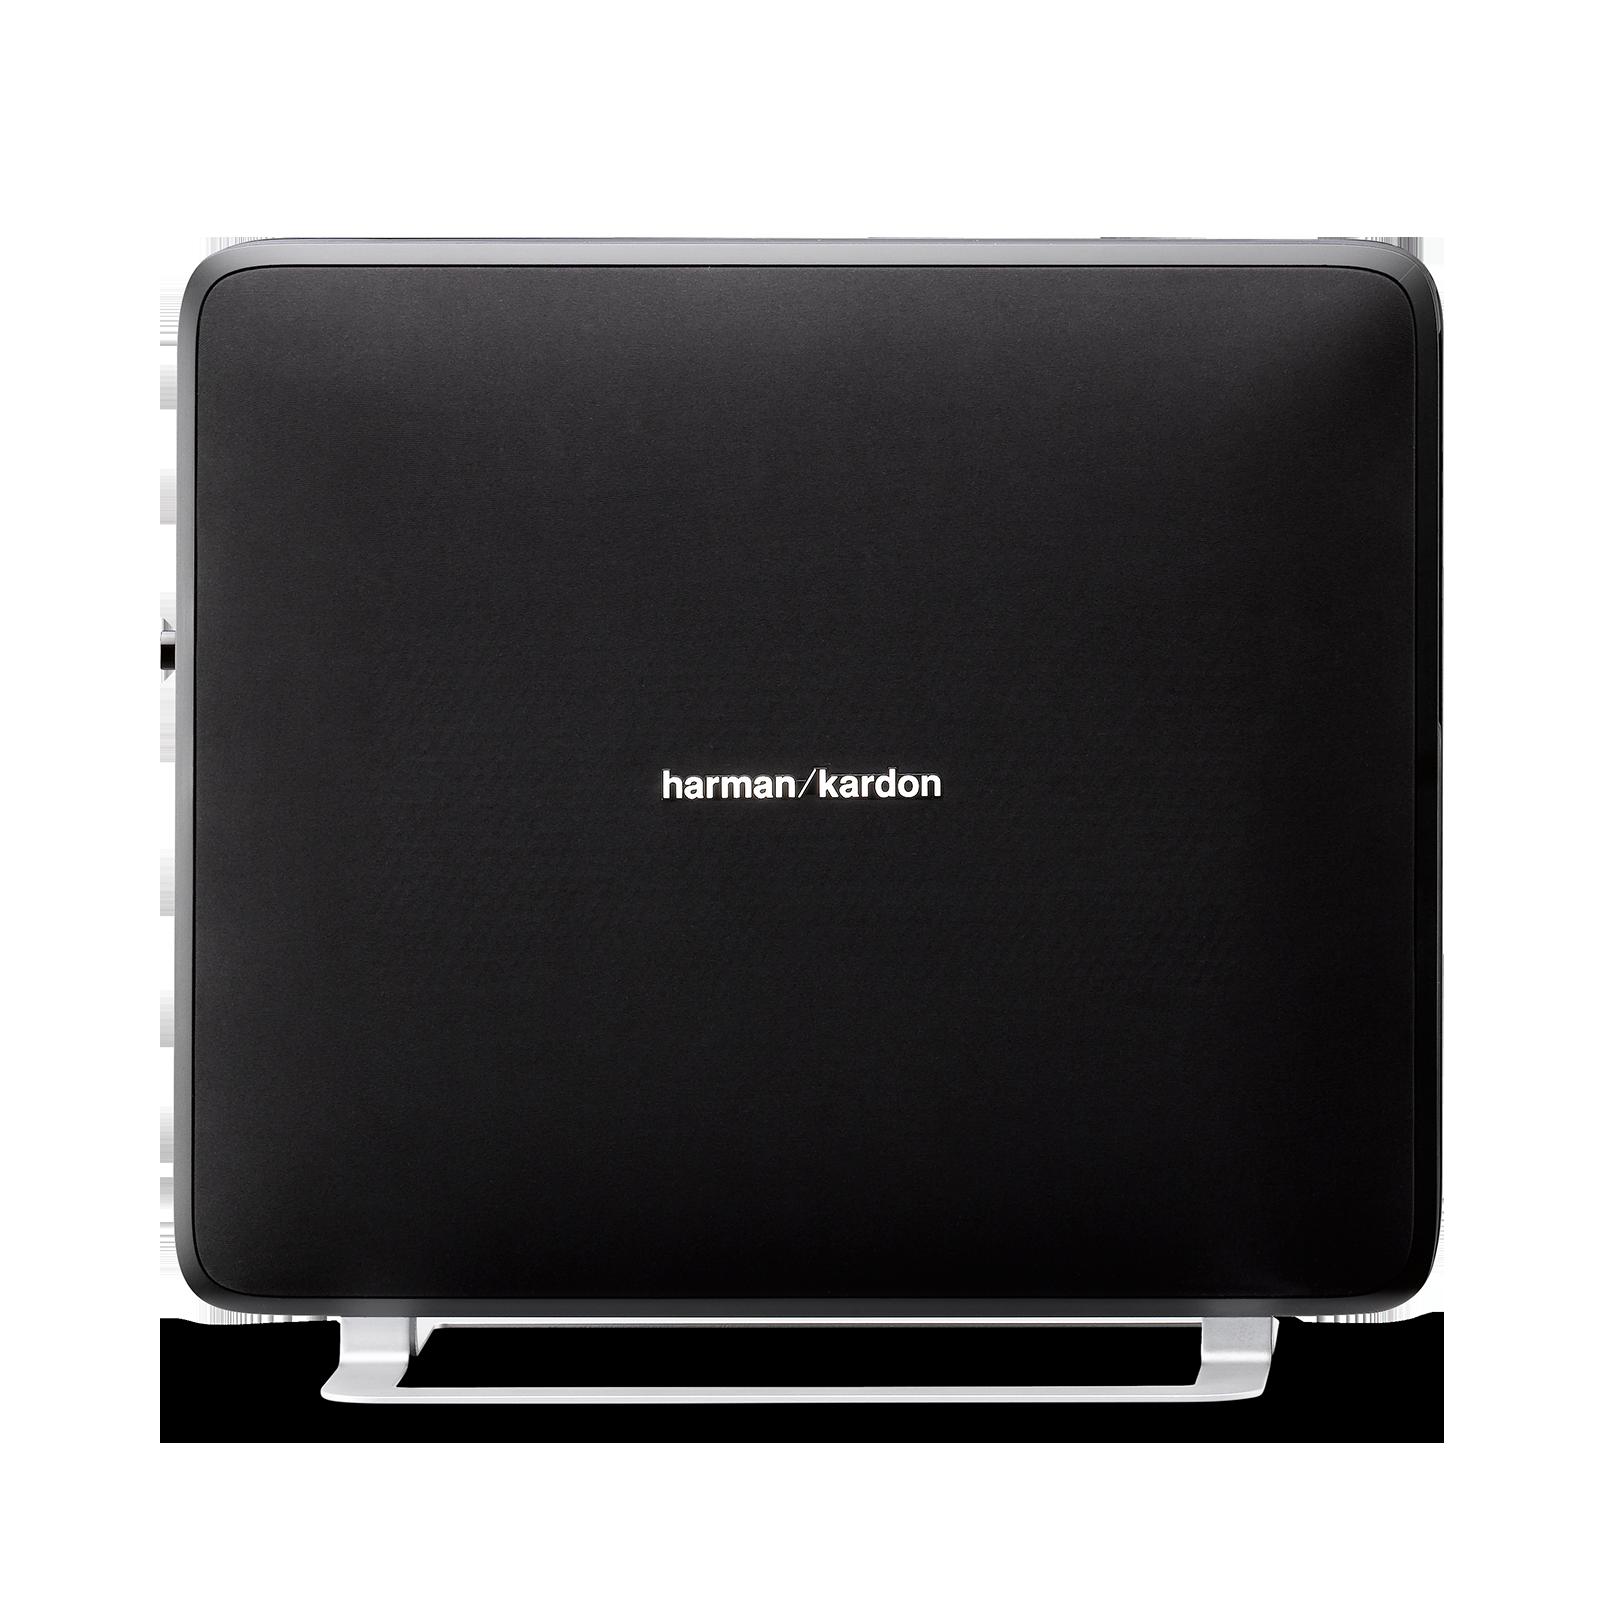 Sabre SB 35 - Black - Devastatingly slim home entertainment soundbar with compact subwoofer. - Front